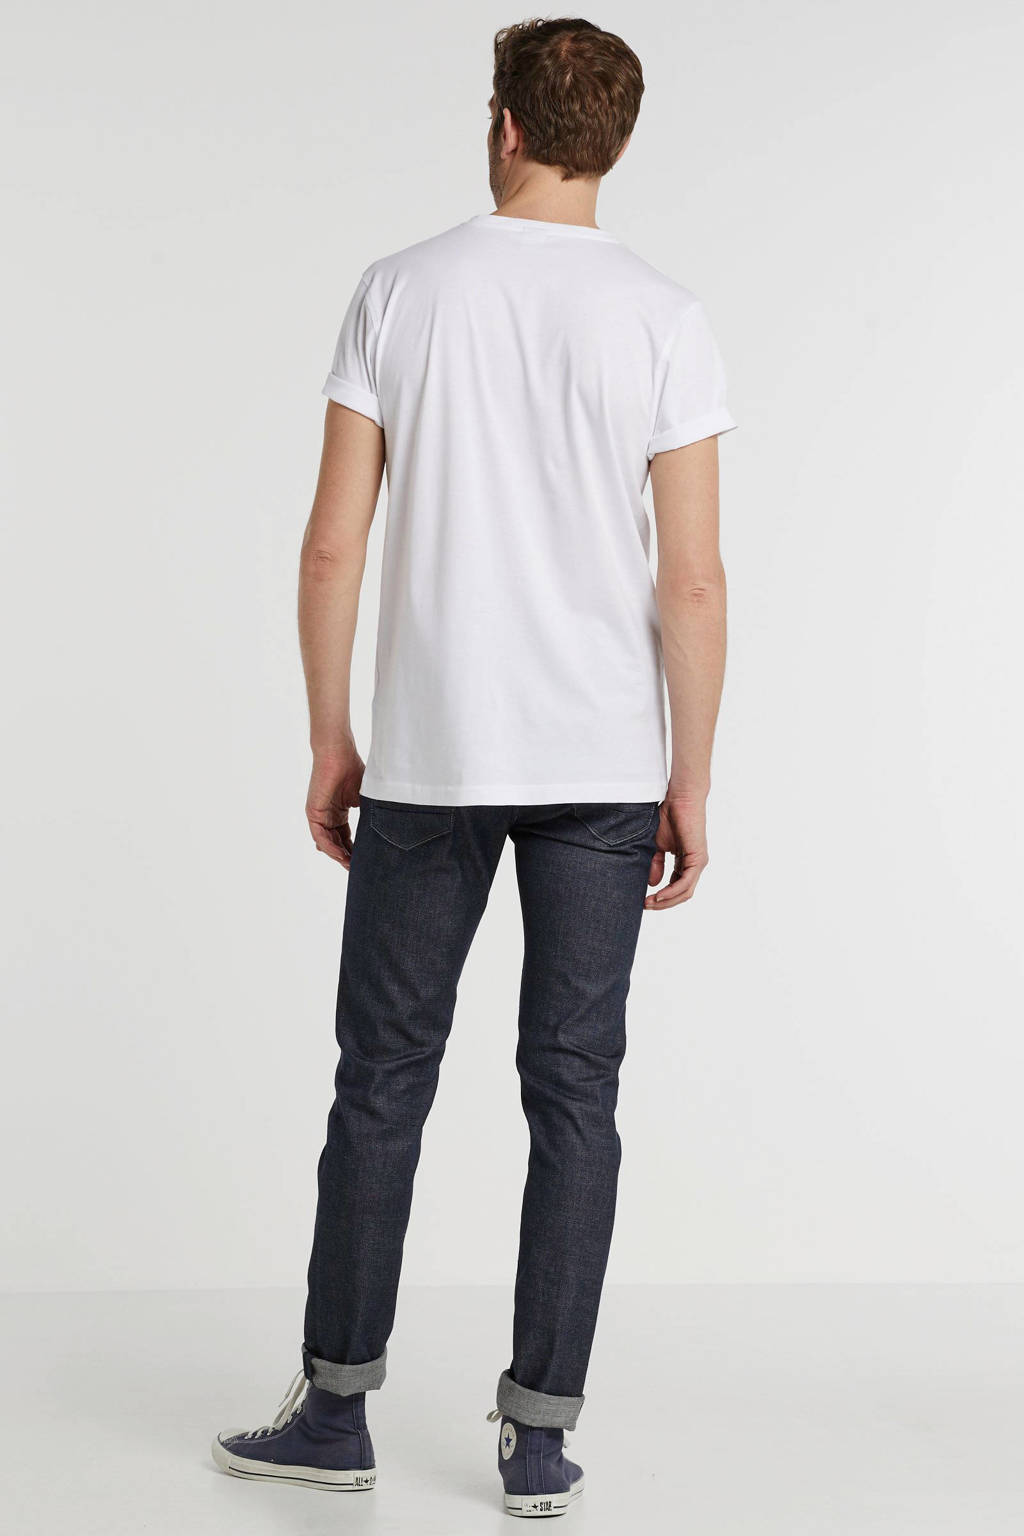 Vanguard slim fit jeans Rider classic rinse, classic Rinse